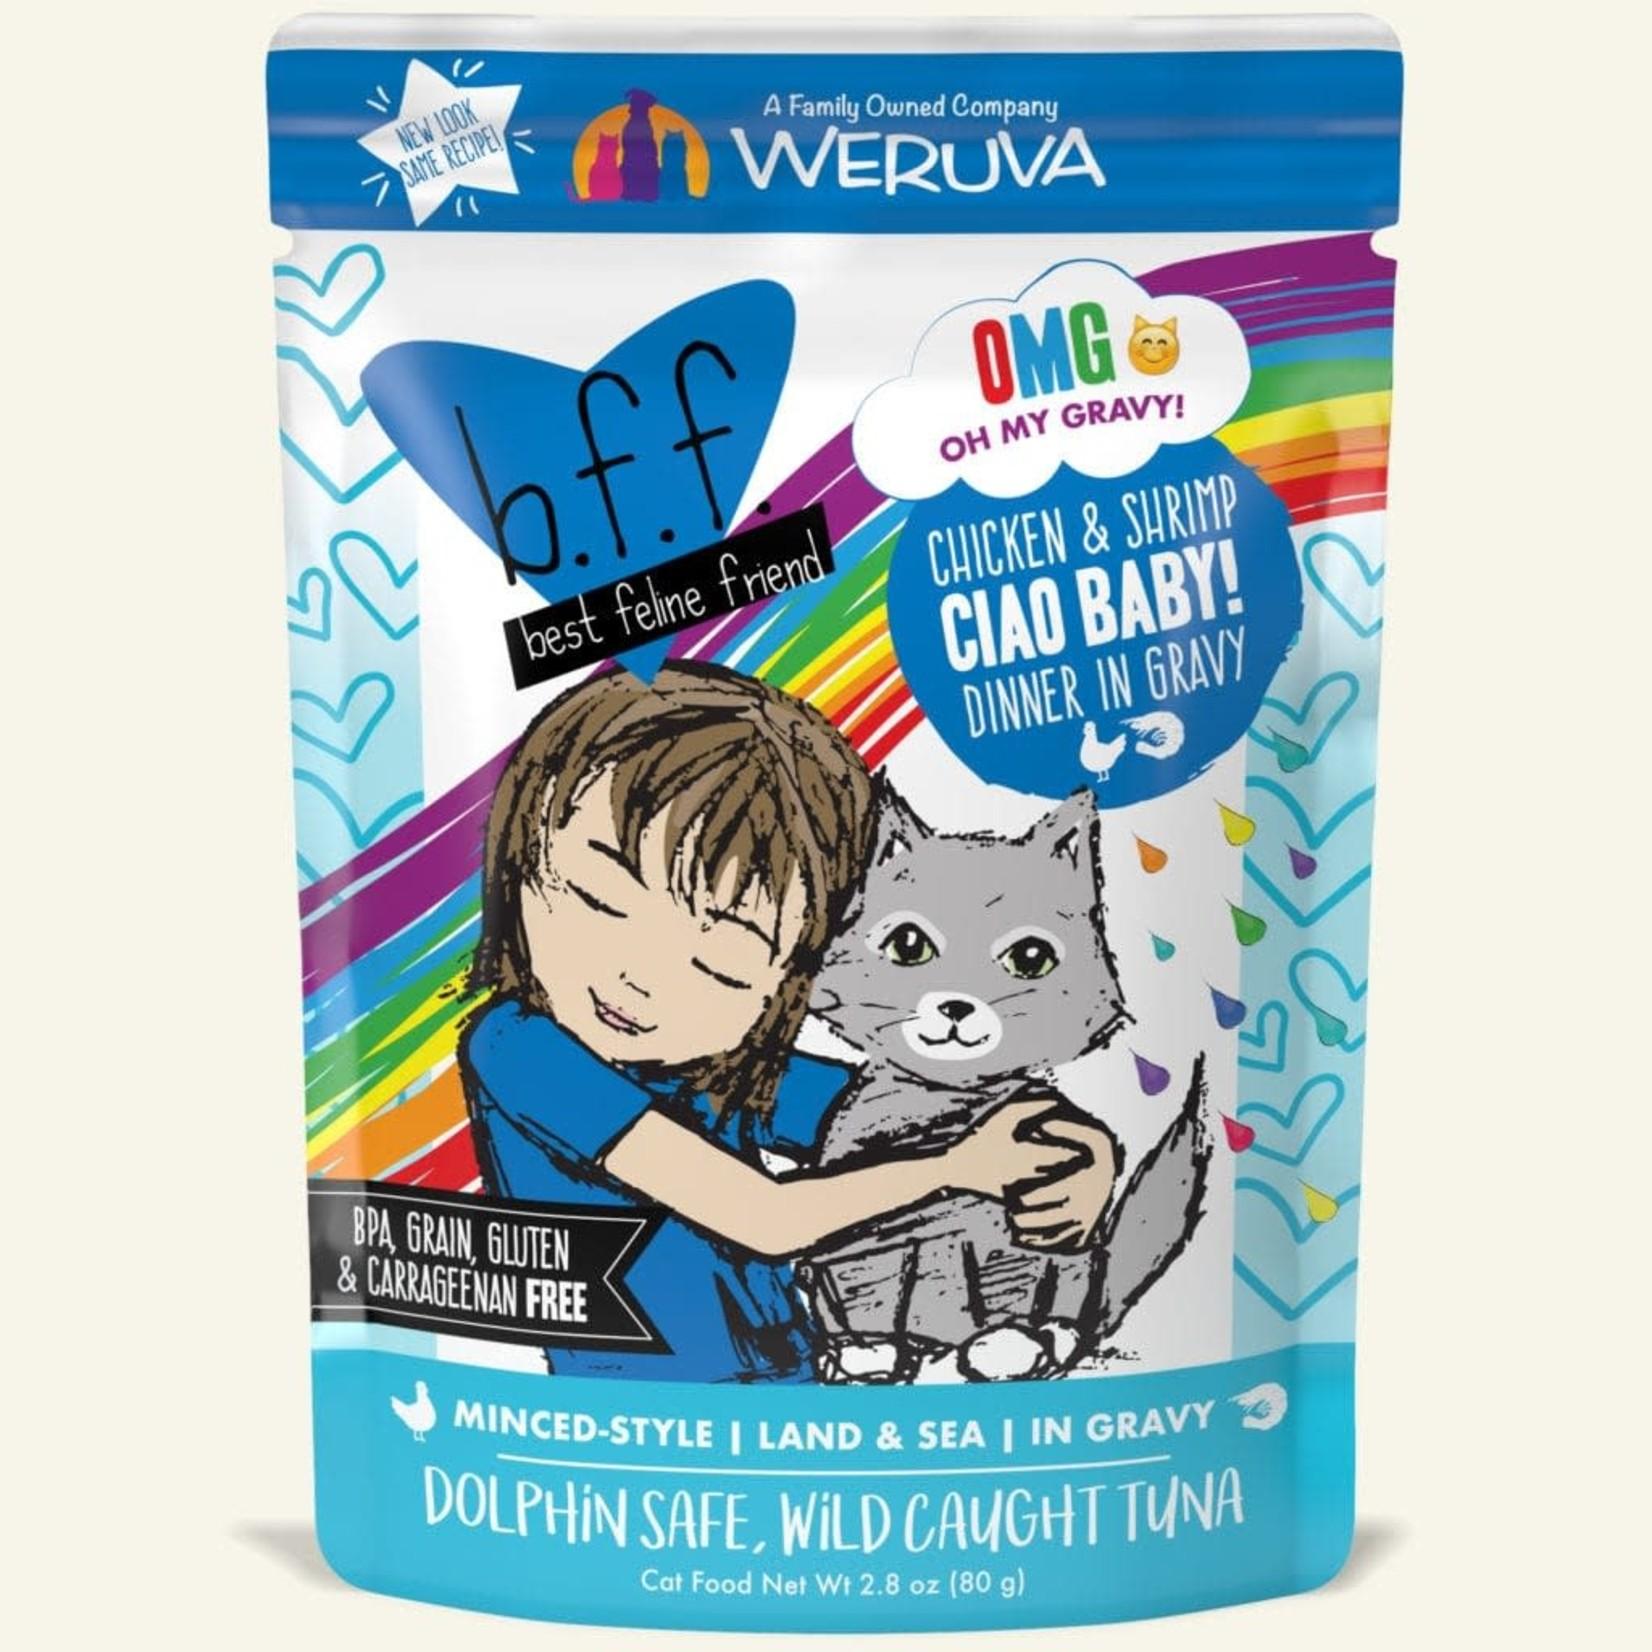 Weruva Inc. BFF OMG Cat Chicken & Shrimp Ciao Baby 2.8 OZ Pouch